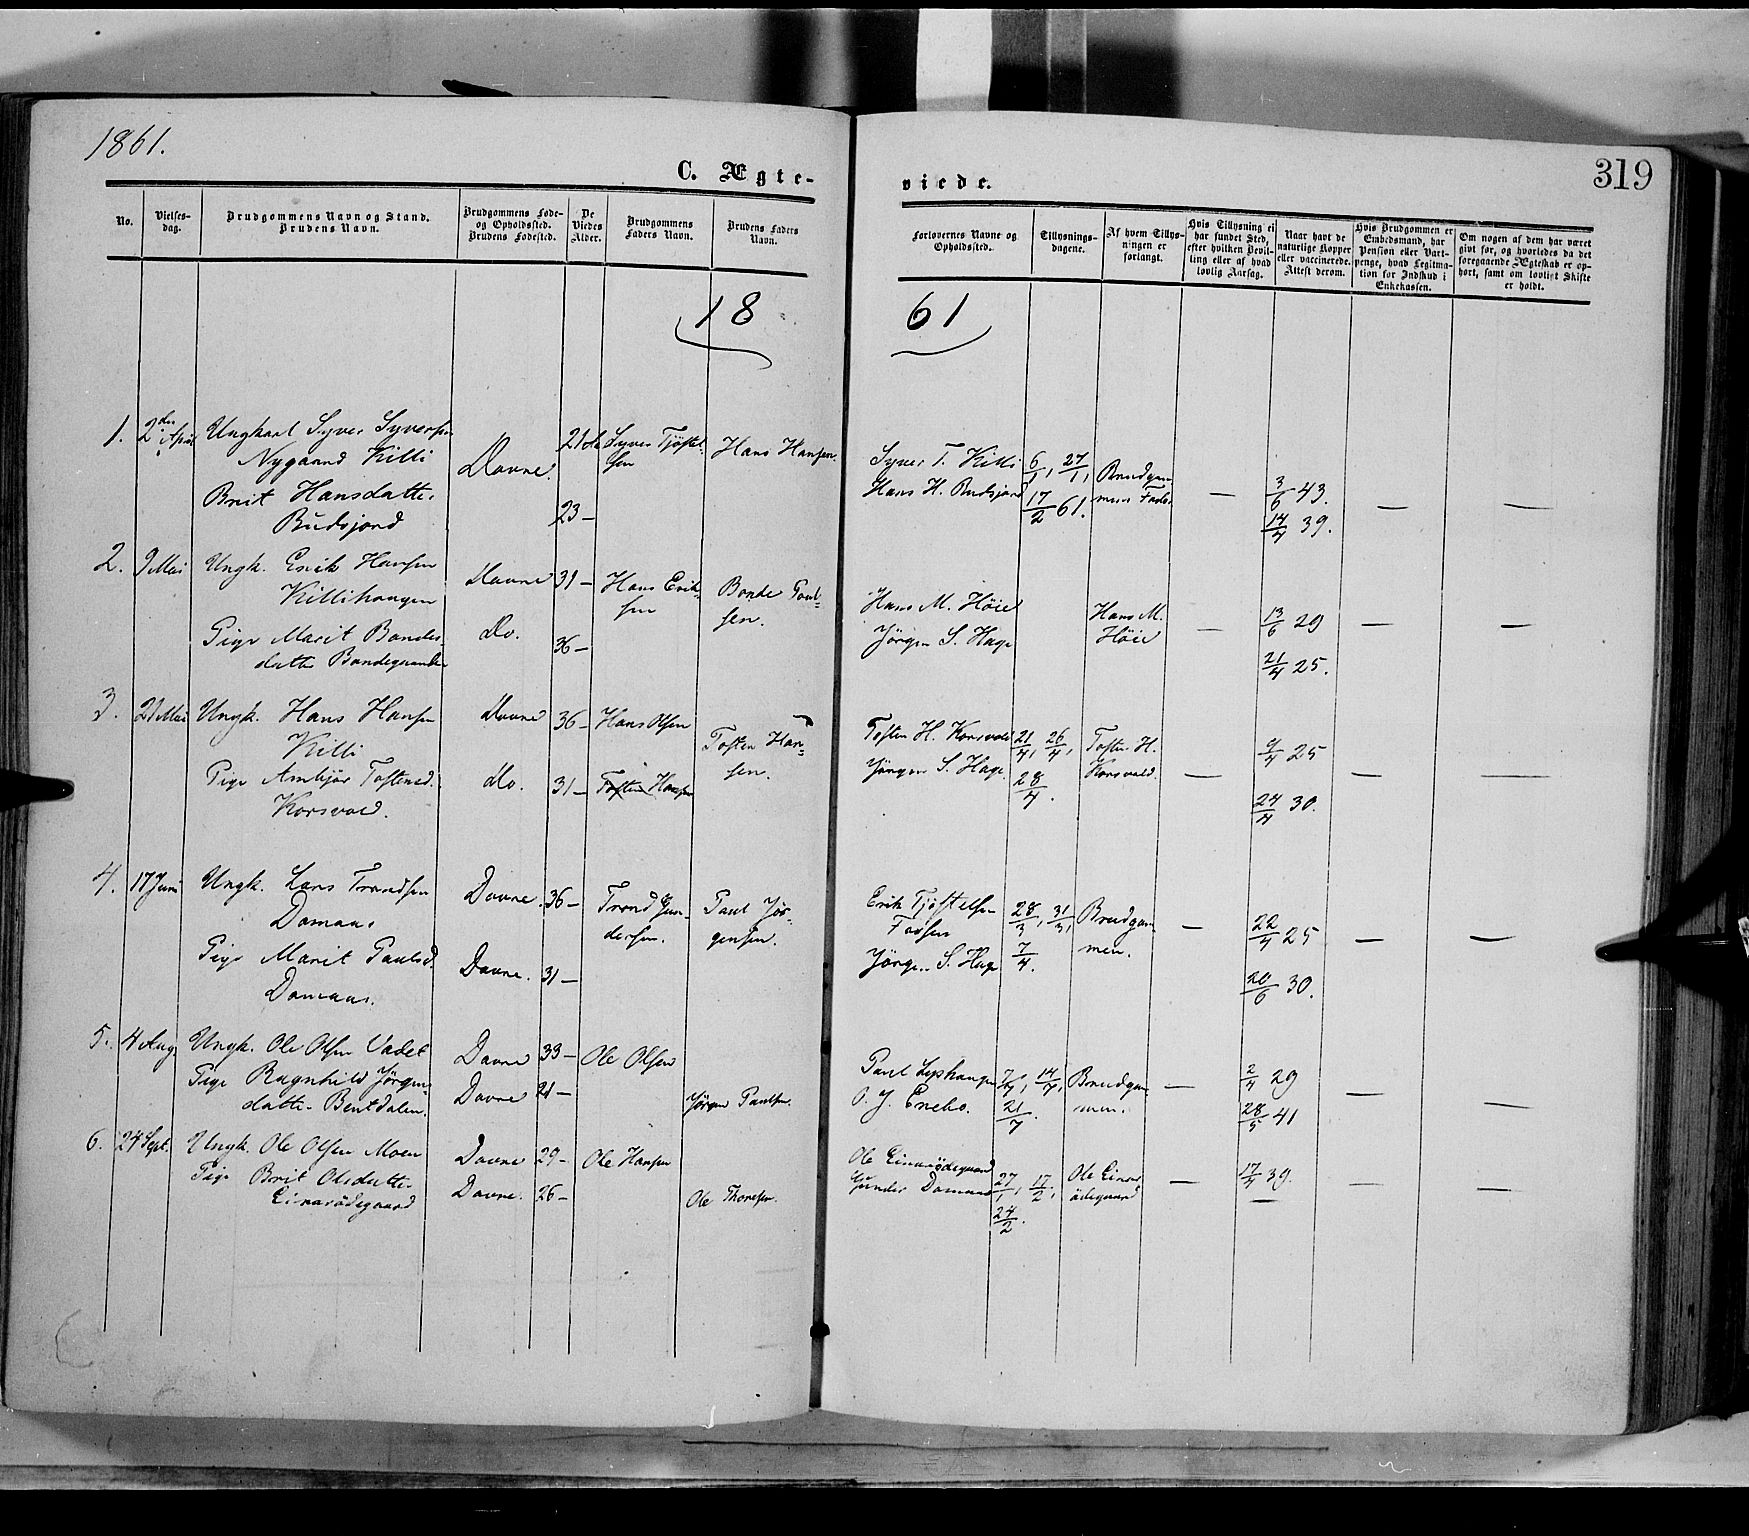 SAH, Dovre prestekontor, Ministerialbok nr. 1, 1854-1878, s. 319